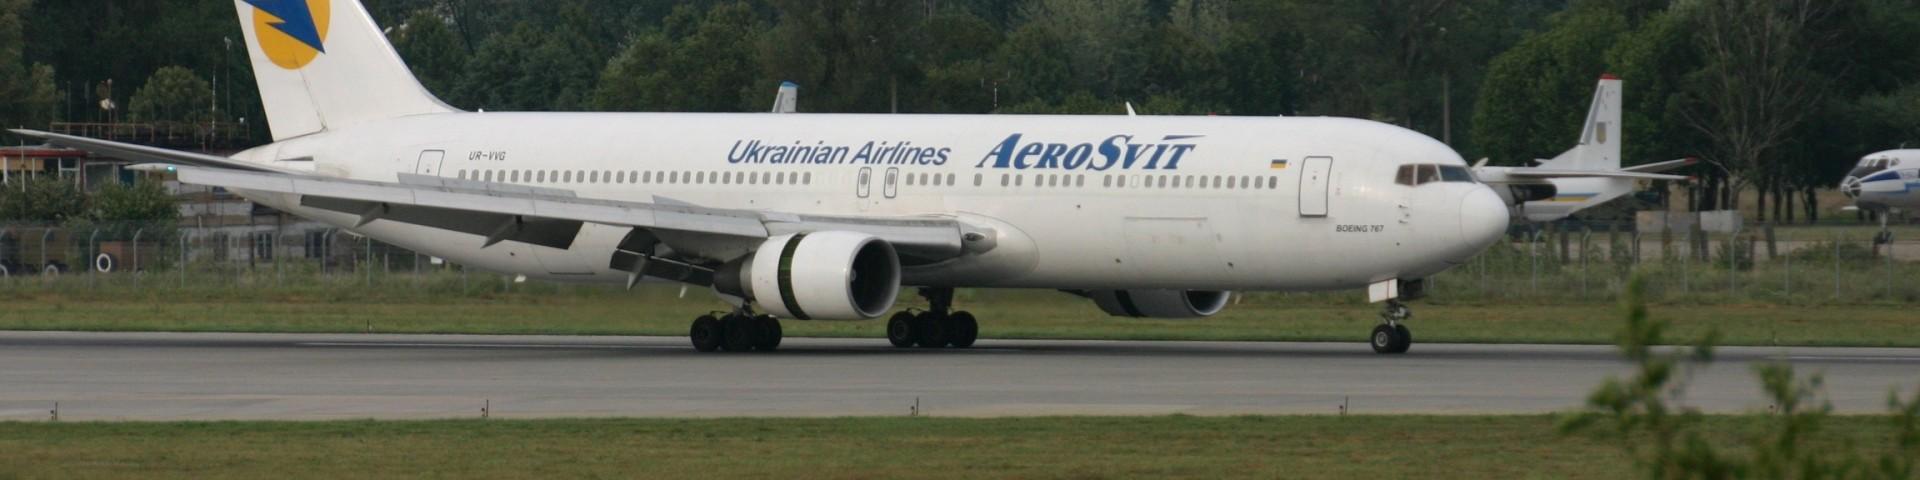 Boeing 767 Aerosvit Airlines